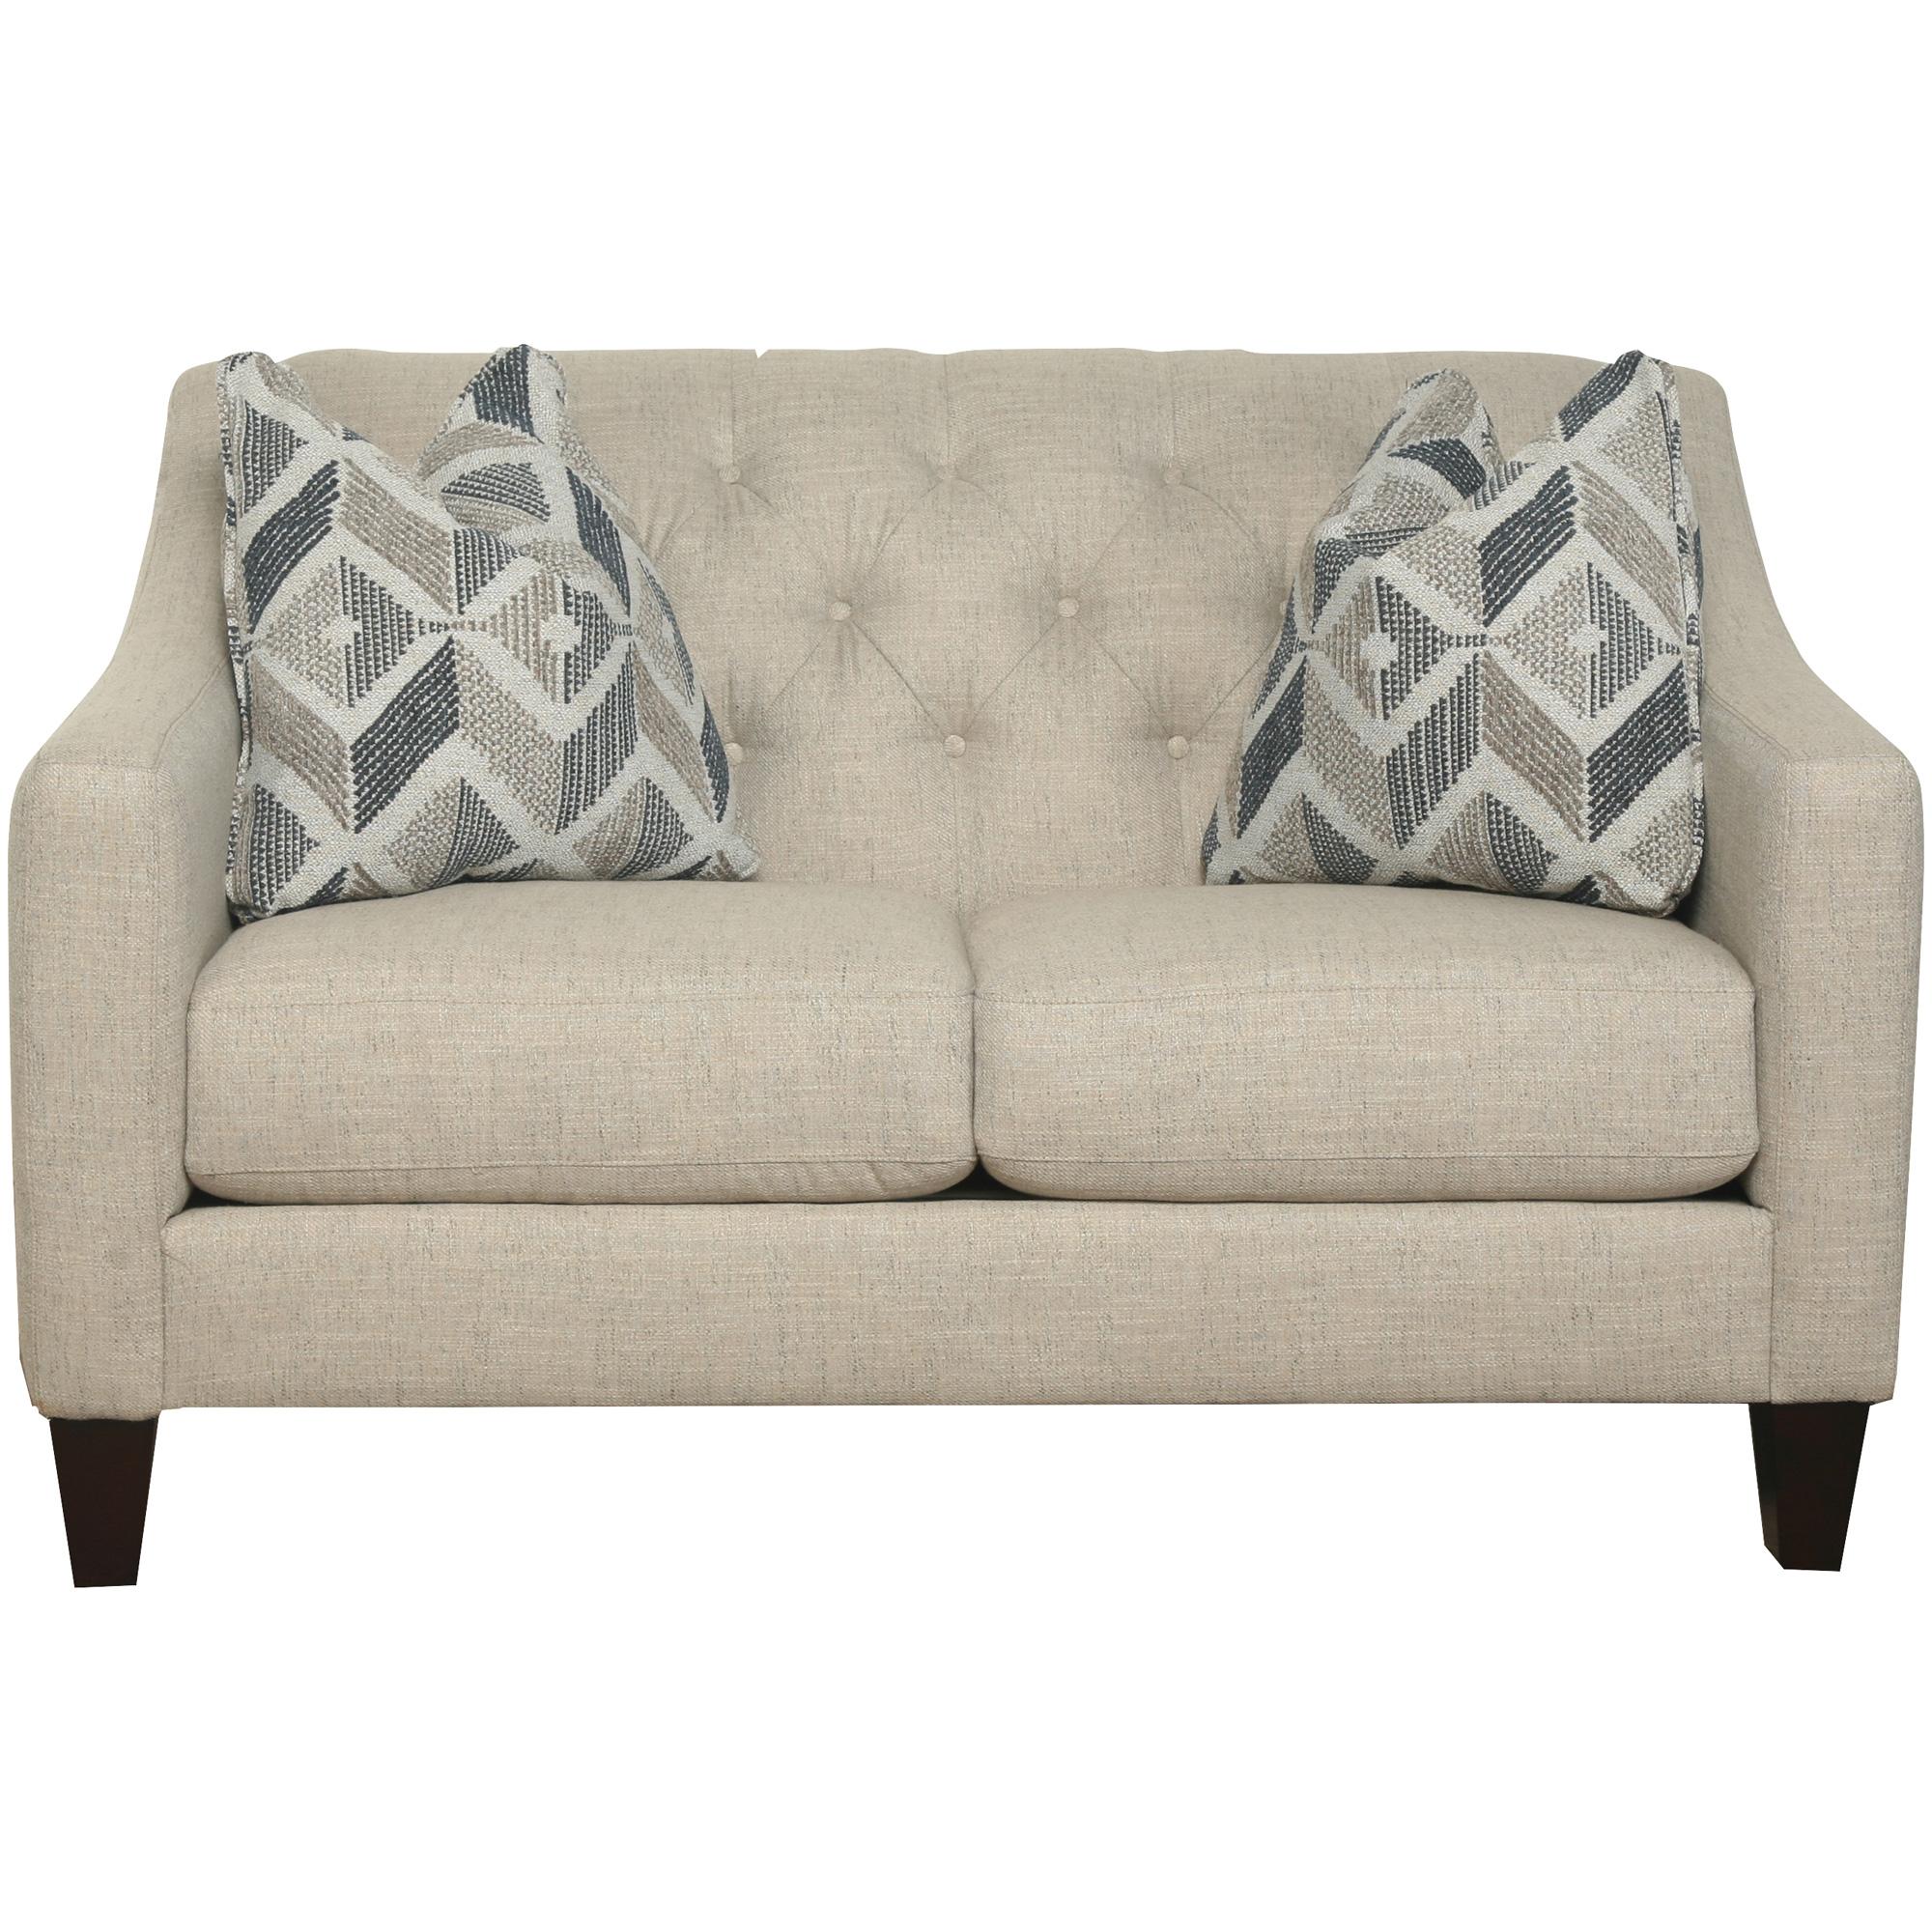 Bauhaus Furniture | Solo Burlap Loveseat Sofa